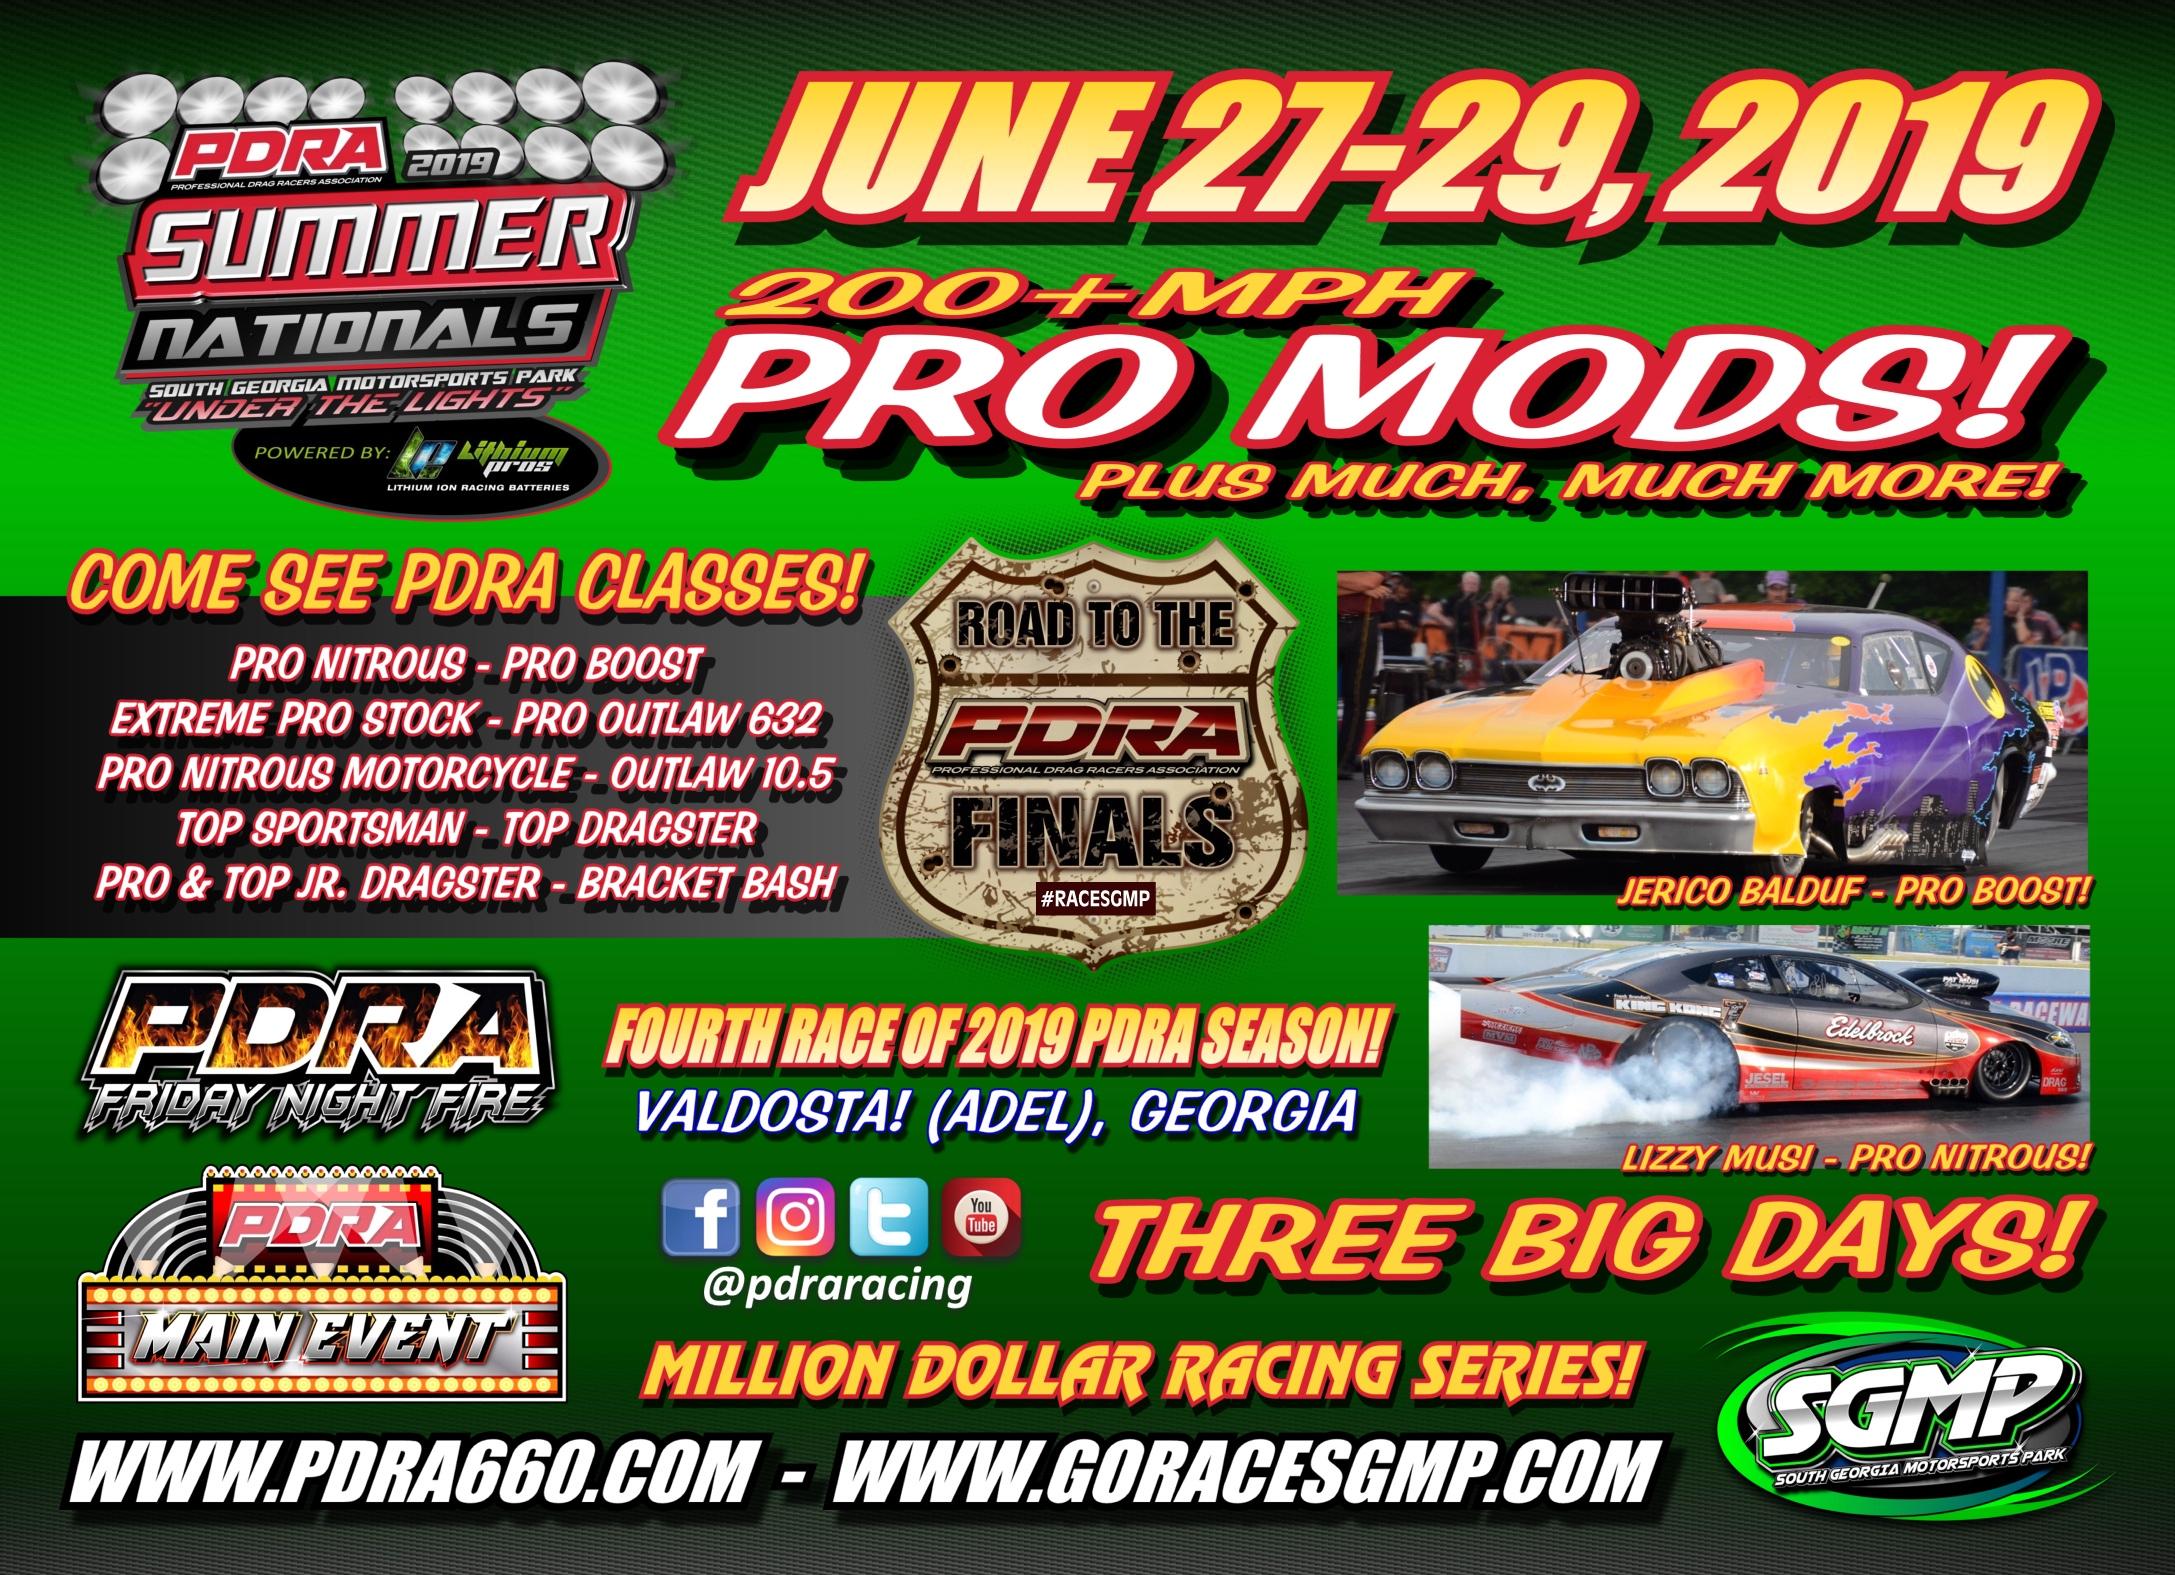 PDRA / Professional Drag Racers Association